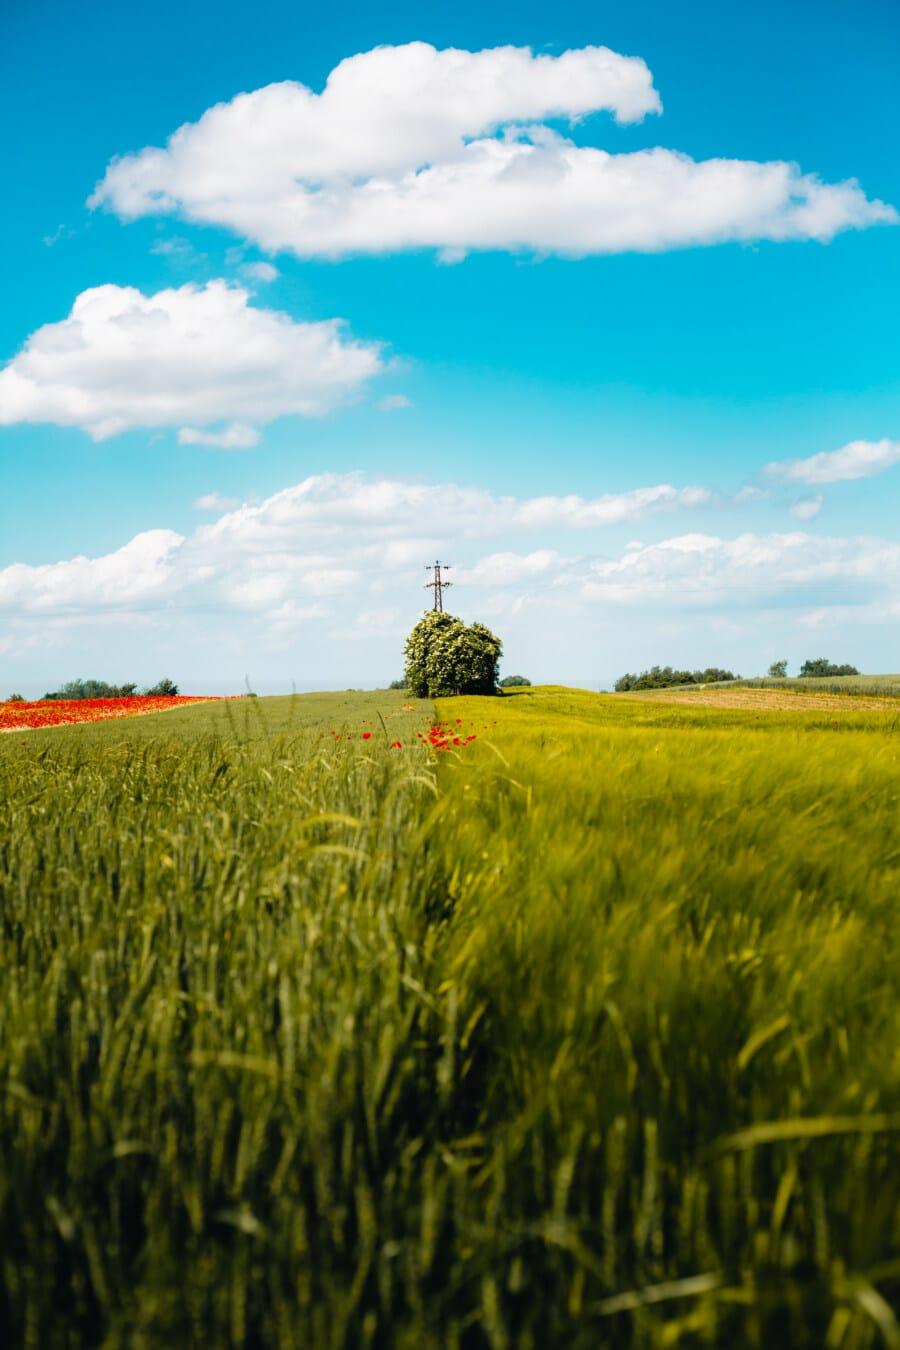 wheatfield, day, sunny, field, rural, cereal, cloud, grass, farm, meadow